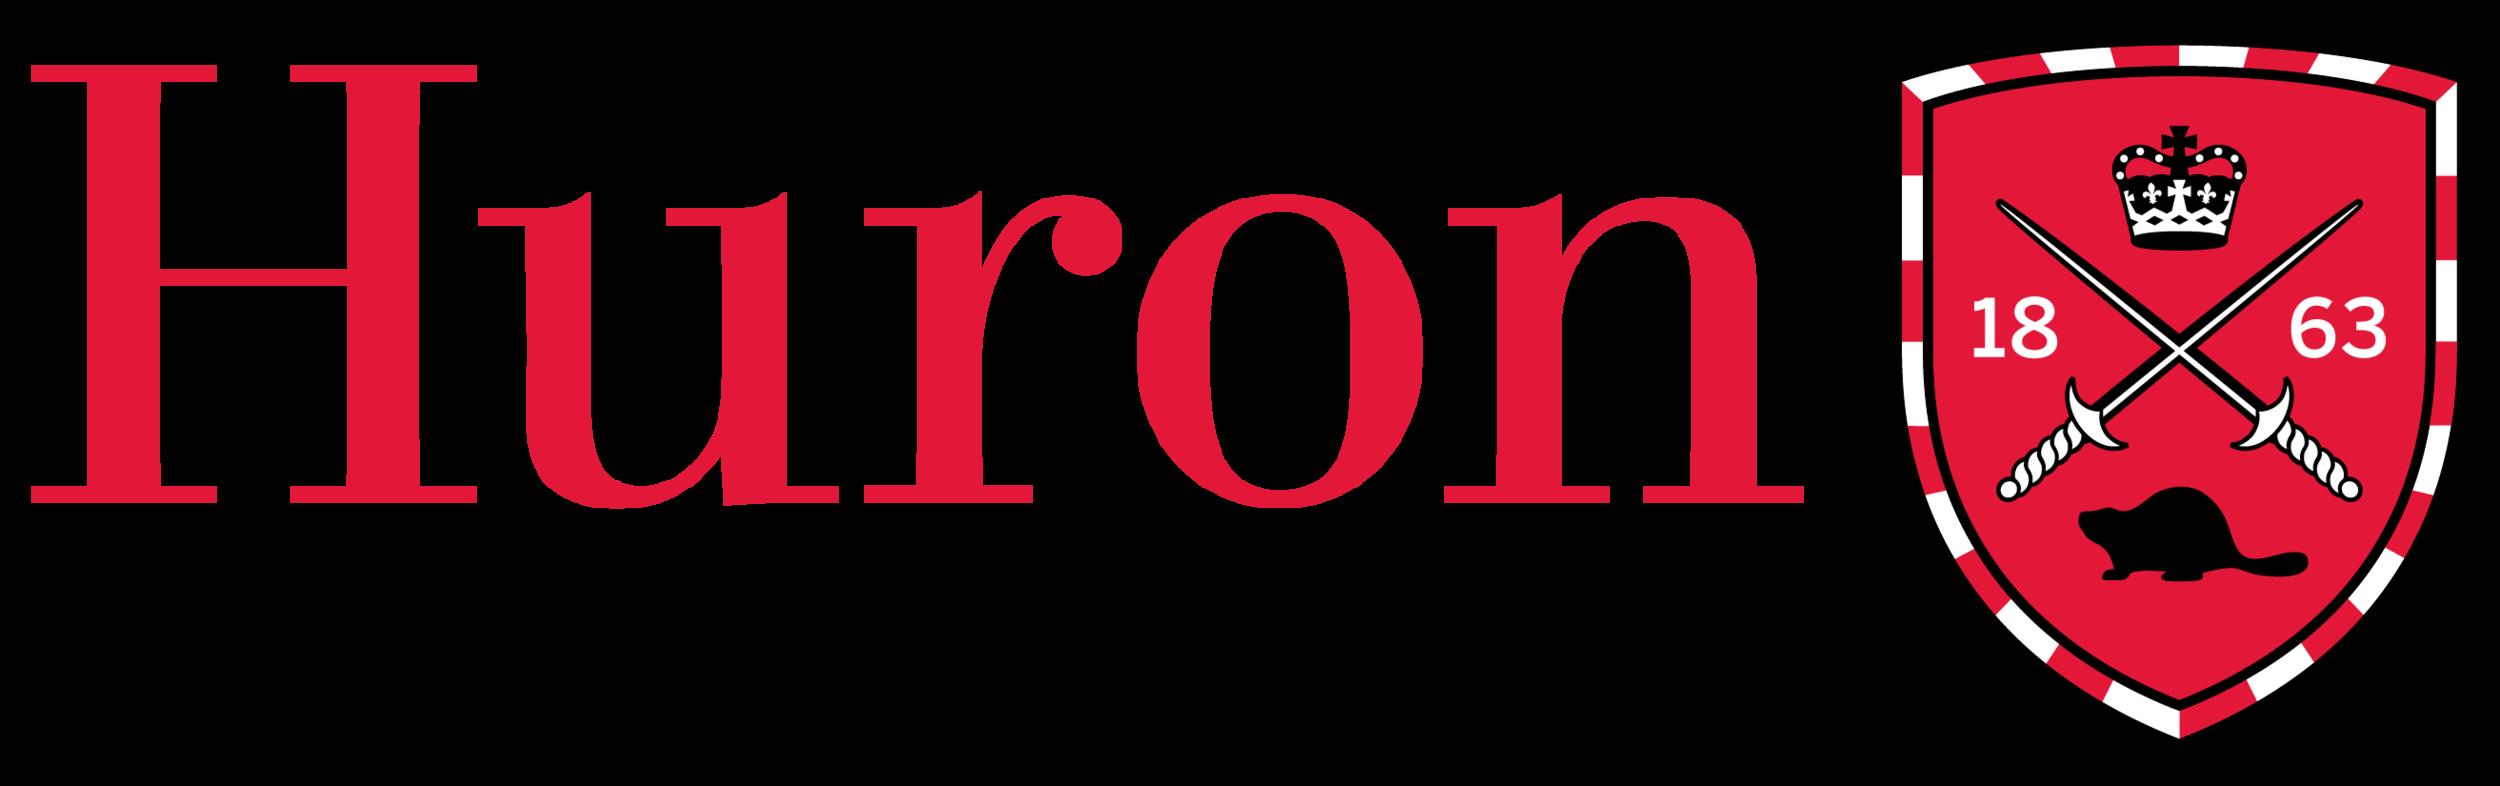 huron-logo.png